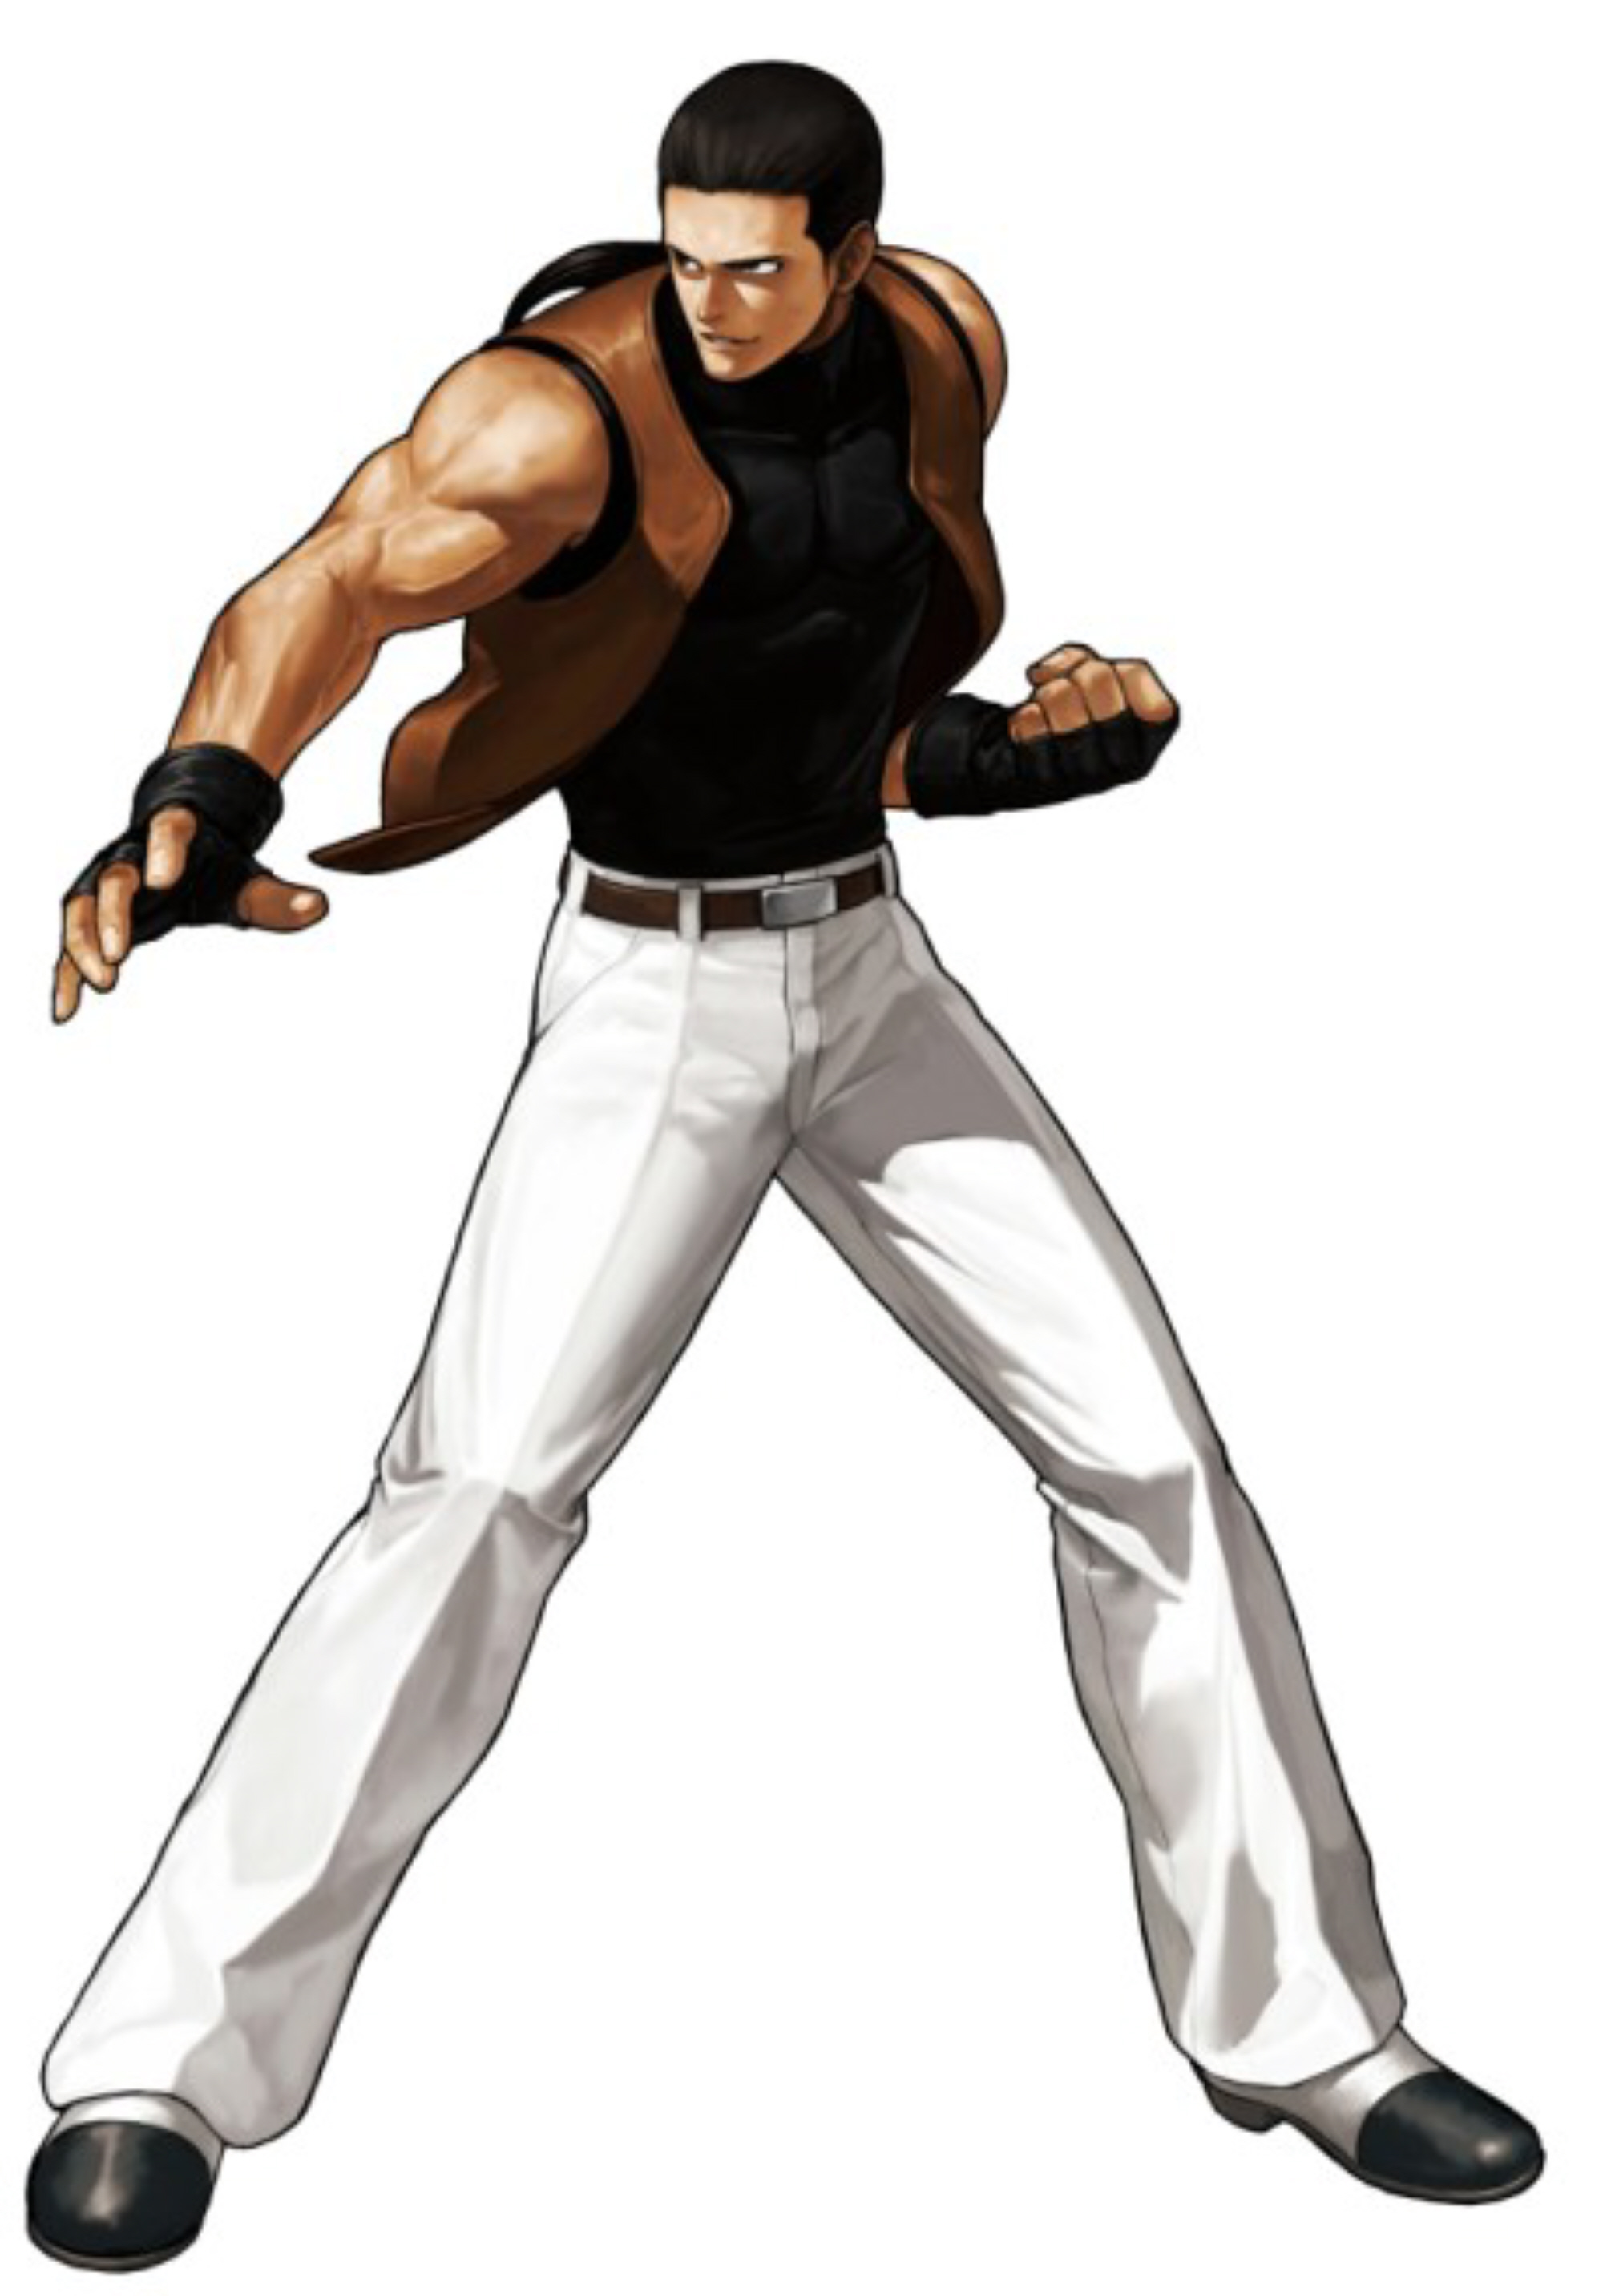 King of fighters xiii robert garcia character artwork - King of fighters characters pictures ...